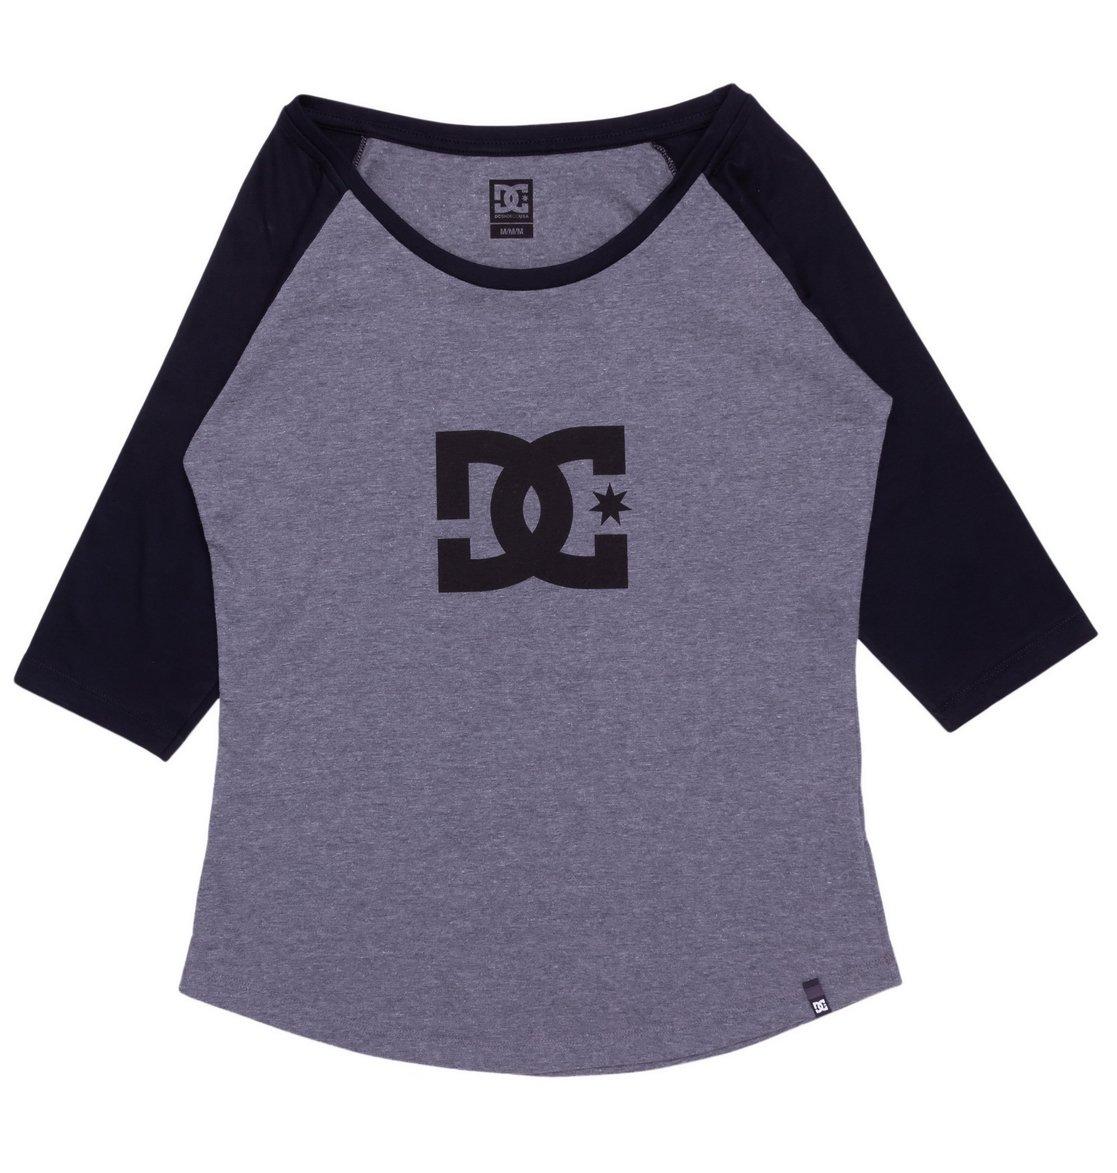 59d6297fd8 Camiseta Feminina 3/4 Star Raglan DC Shoes BR7909447415541 | DC Shoes